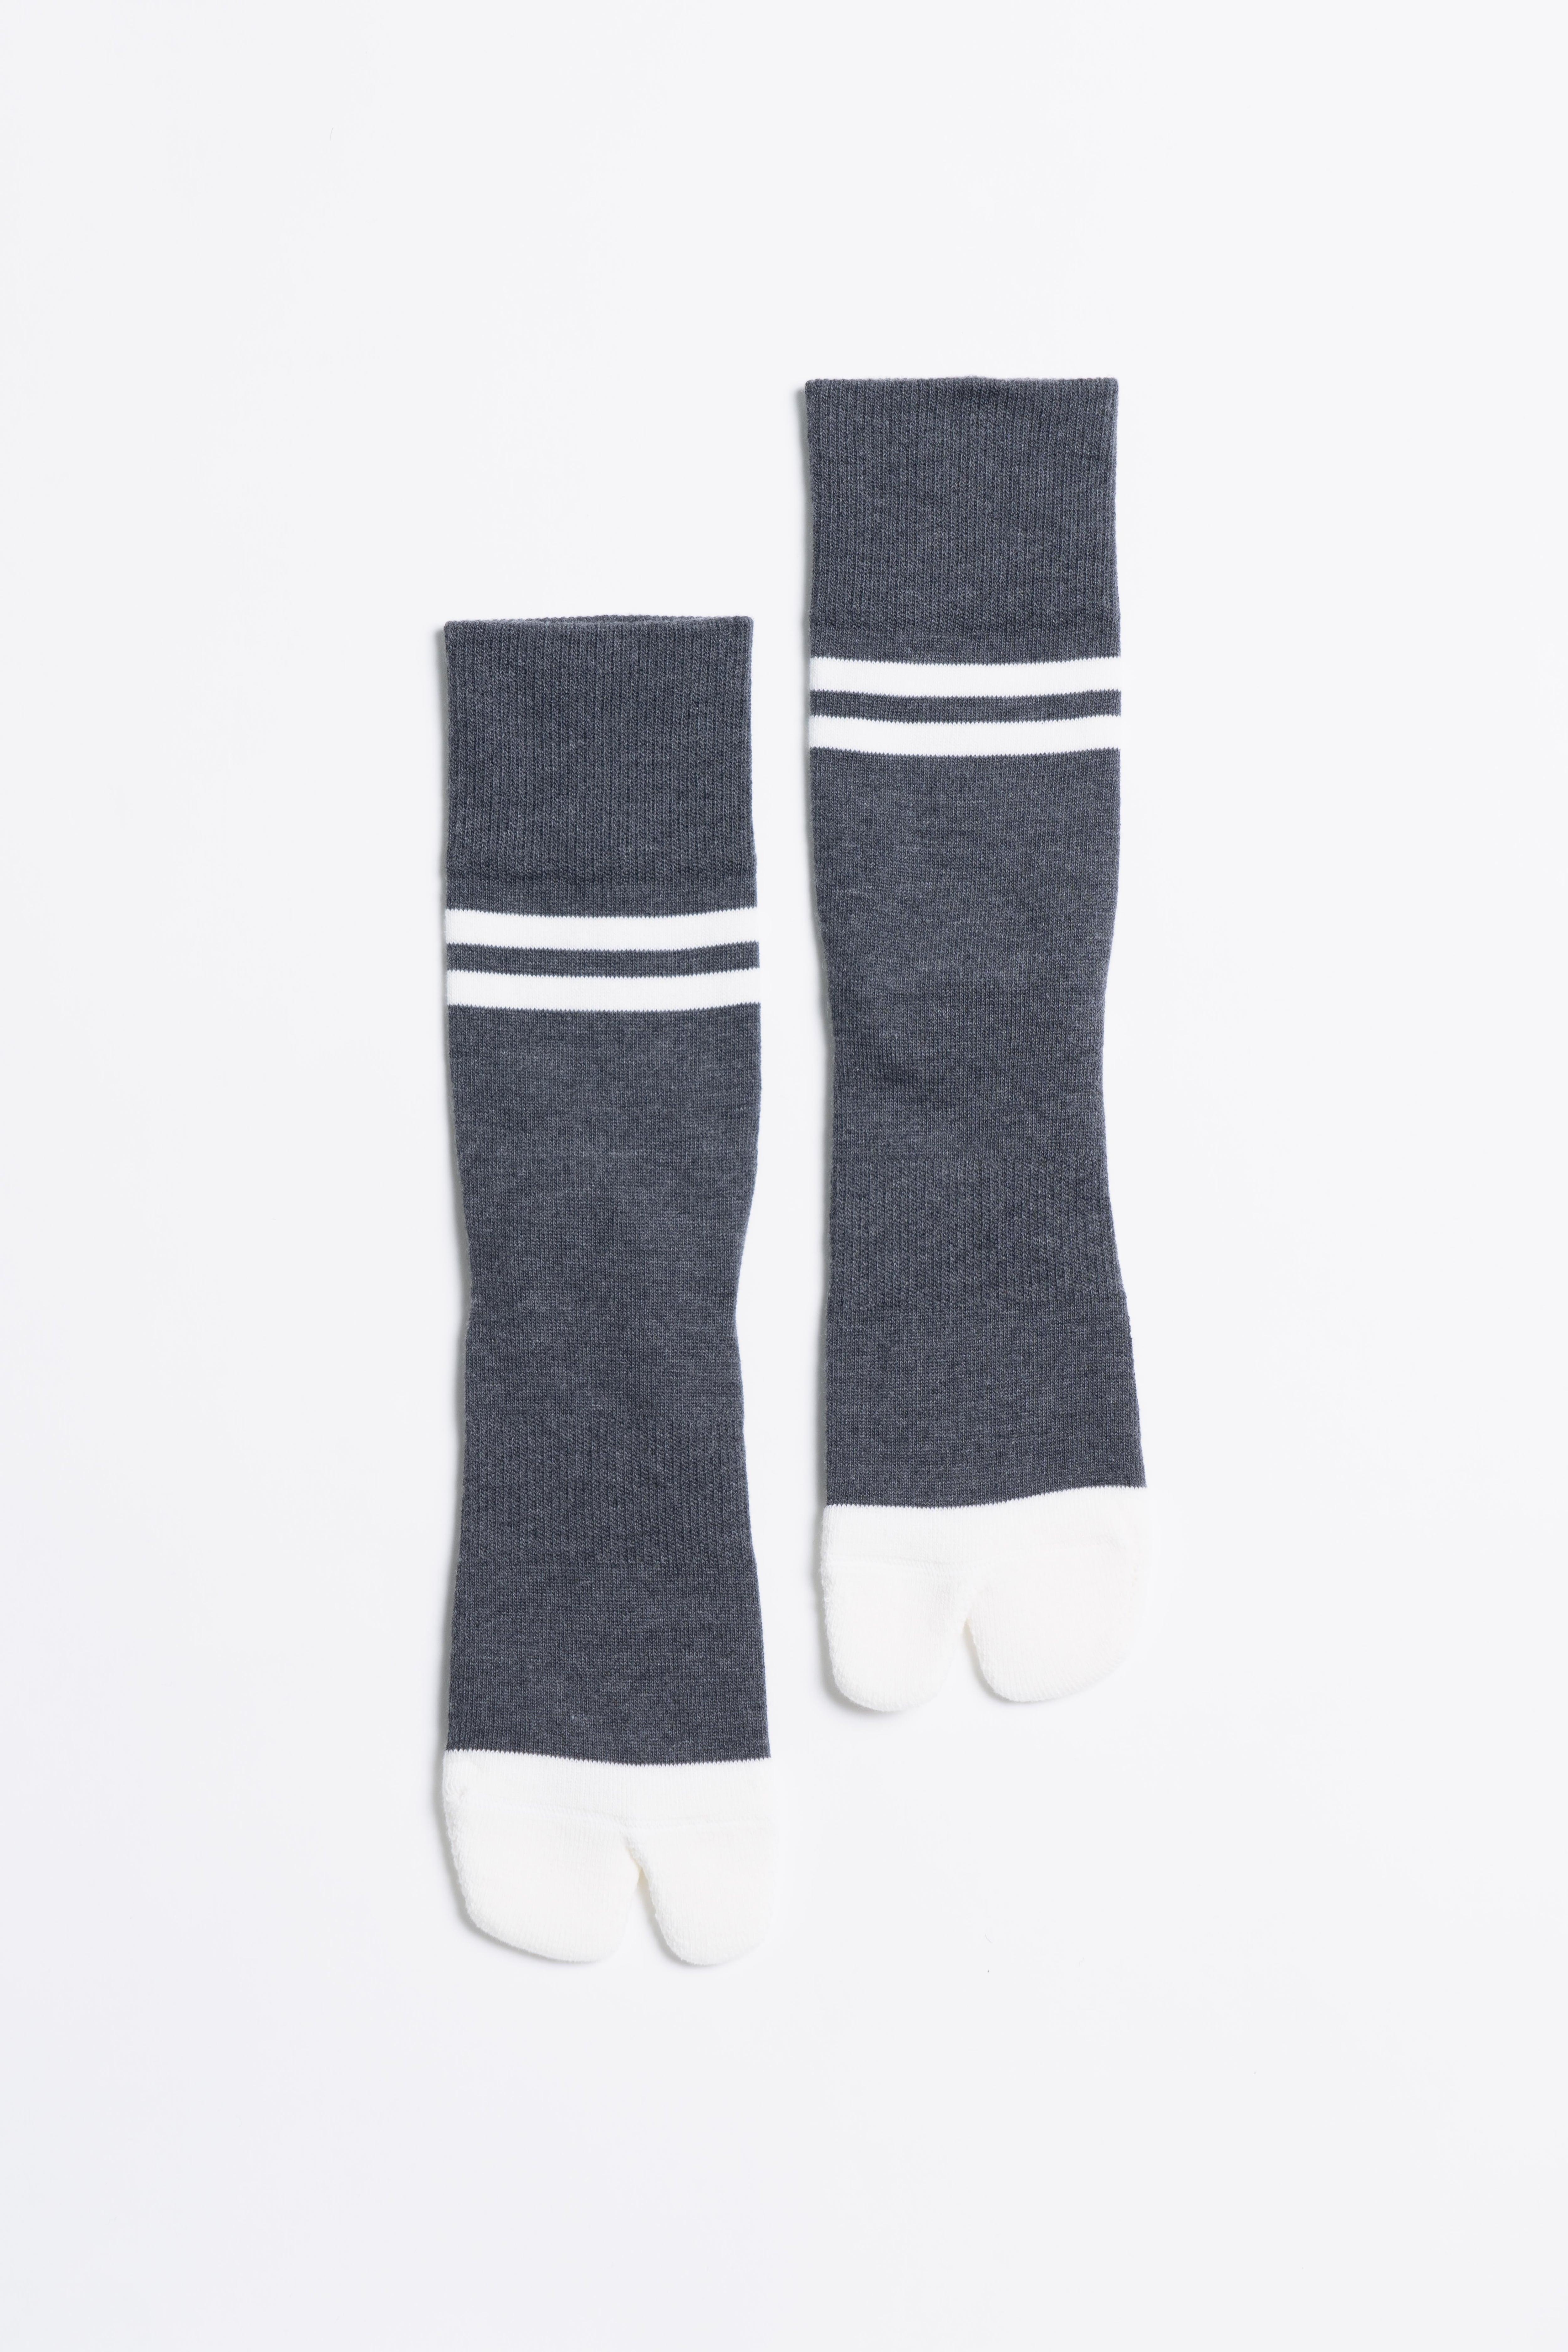 '90s Line Socks(Charcoal × White)